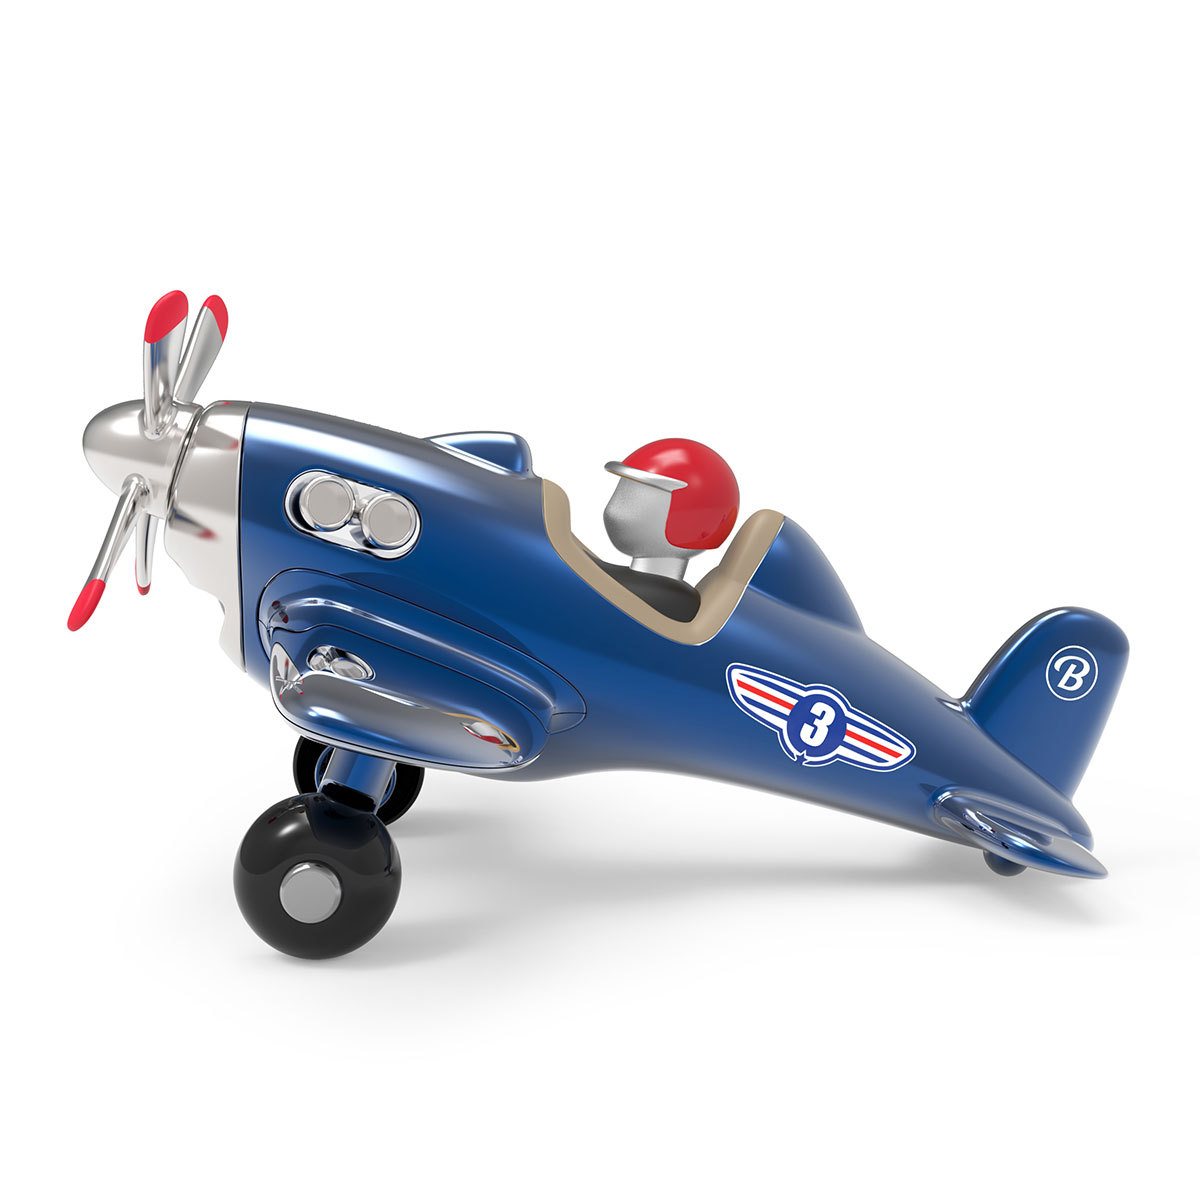 Mes premiers jouets Jet Plane - Bleu